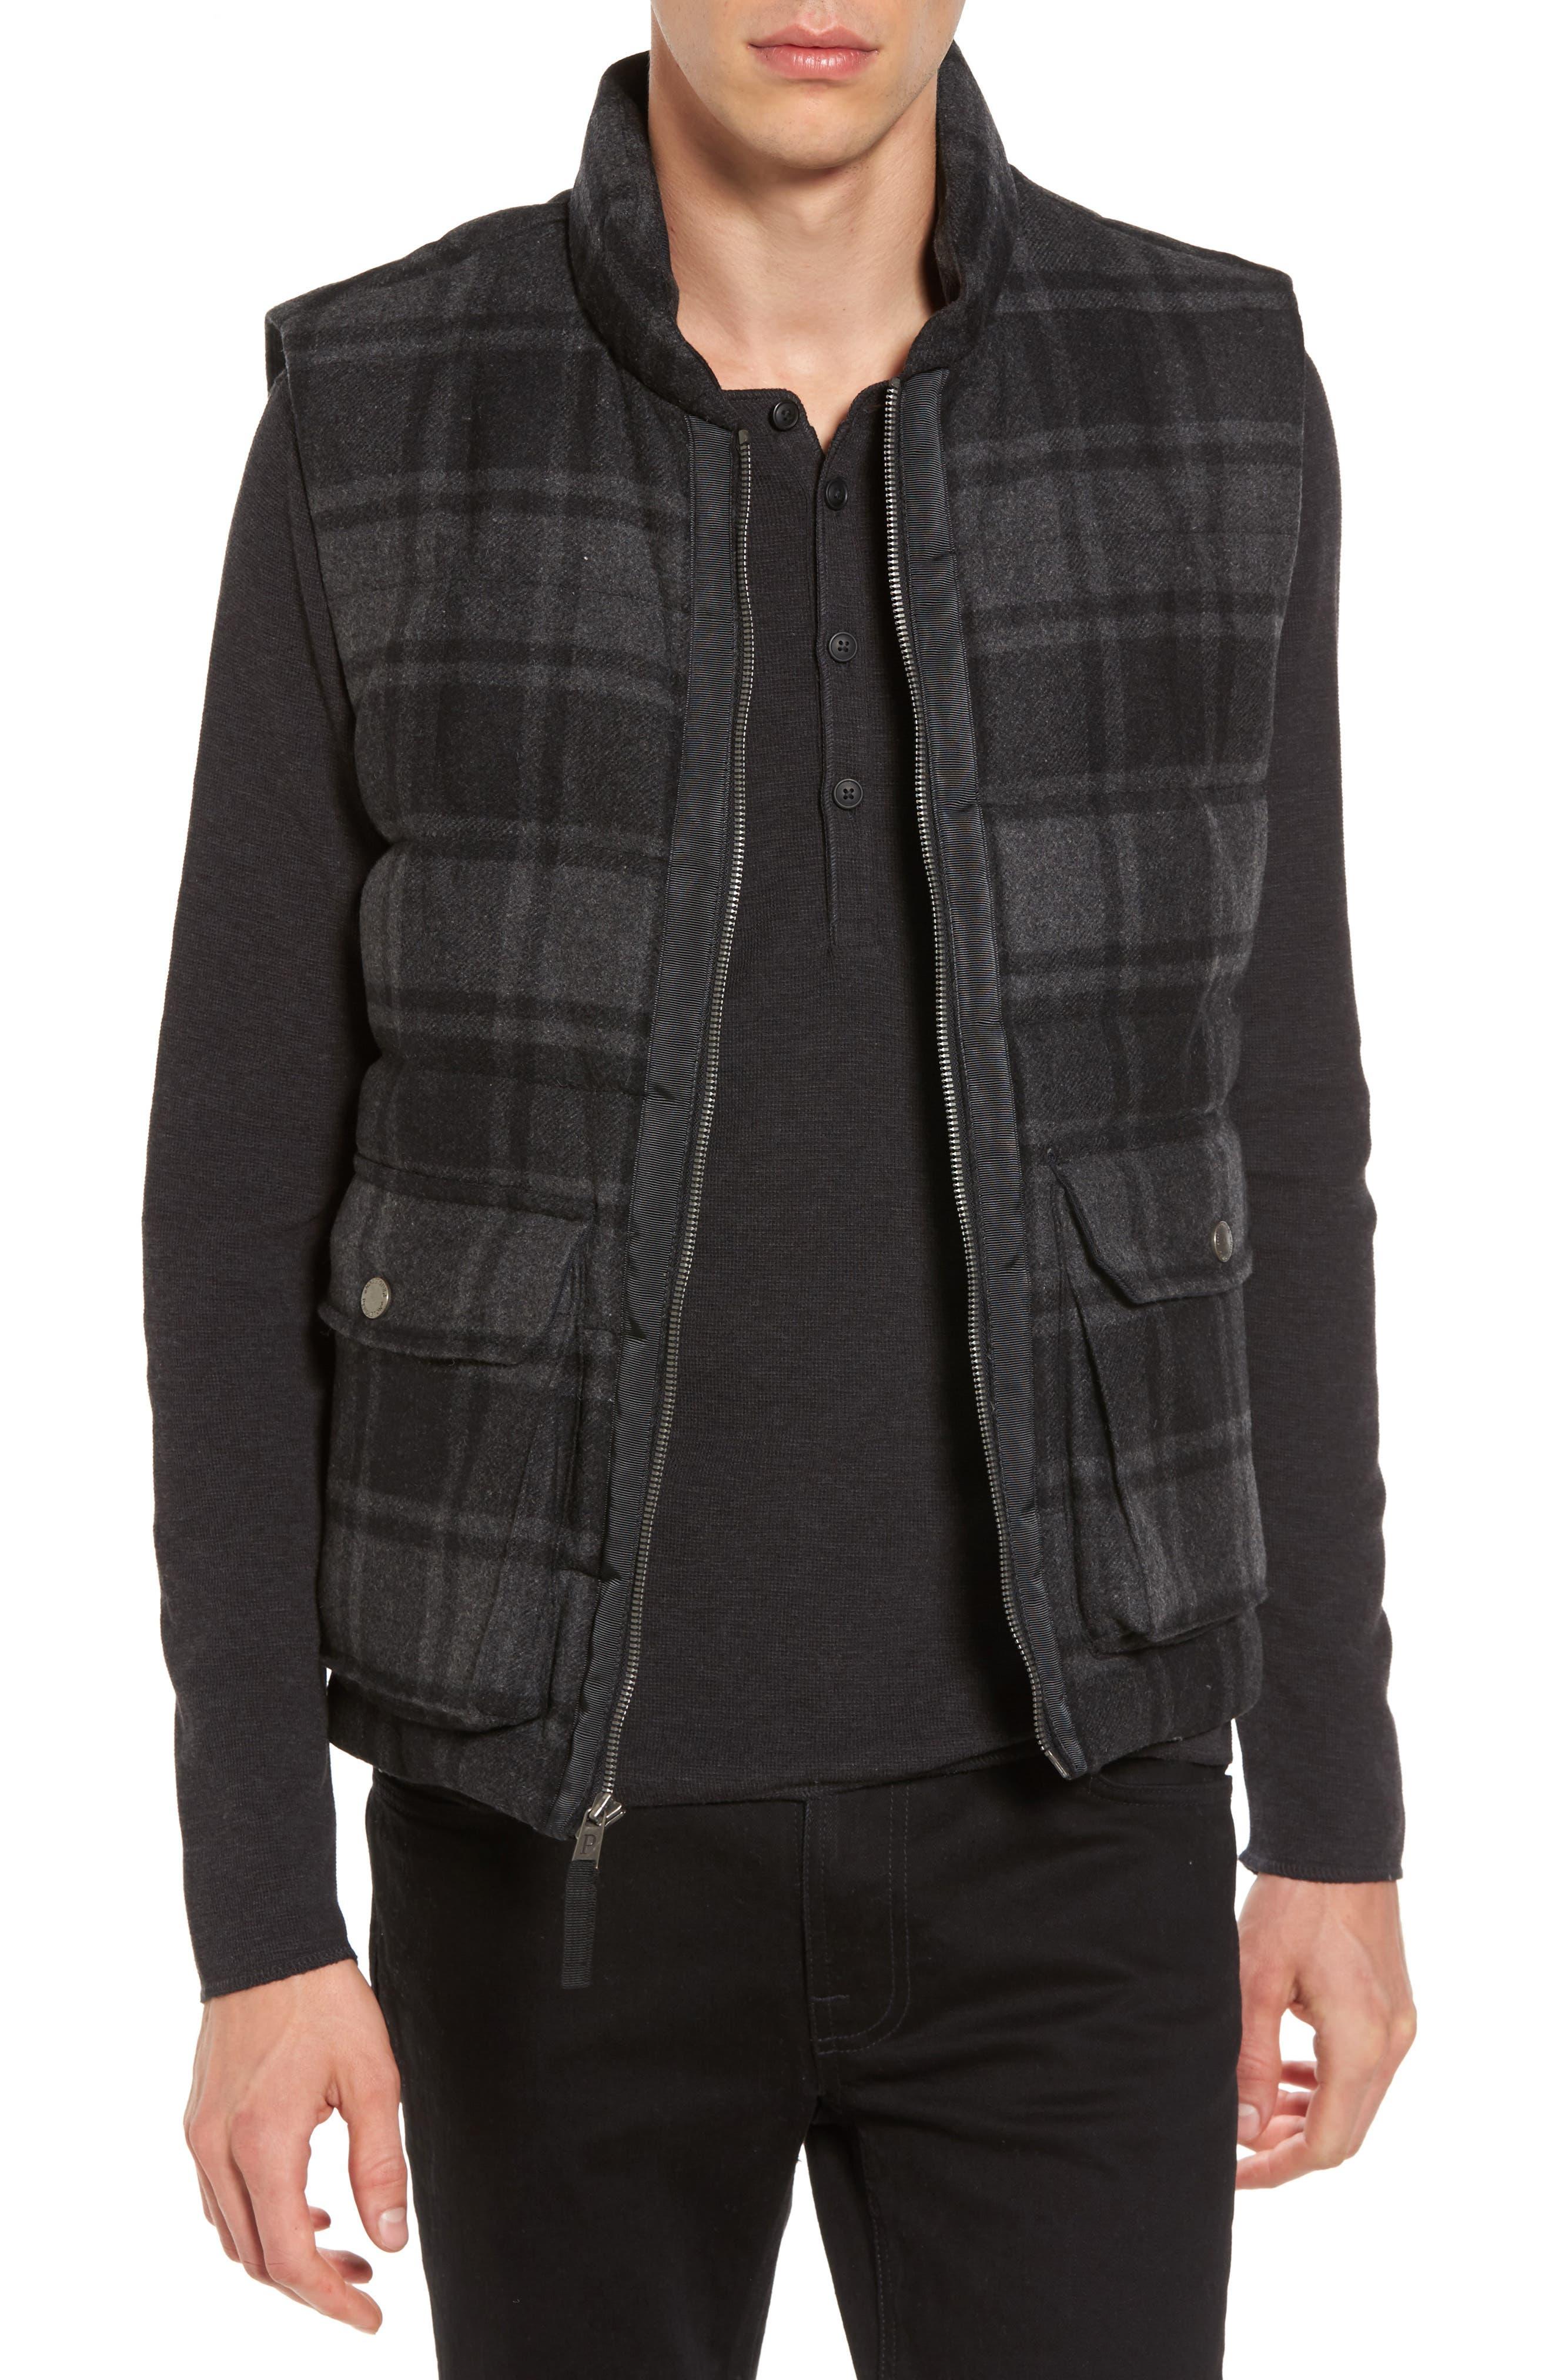 Yosemite Jacket,                             Main thumbnail 1, color,                             Black/ Charcoal Plaid